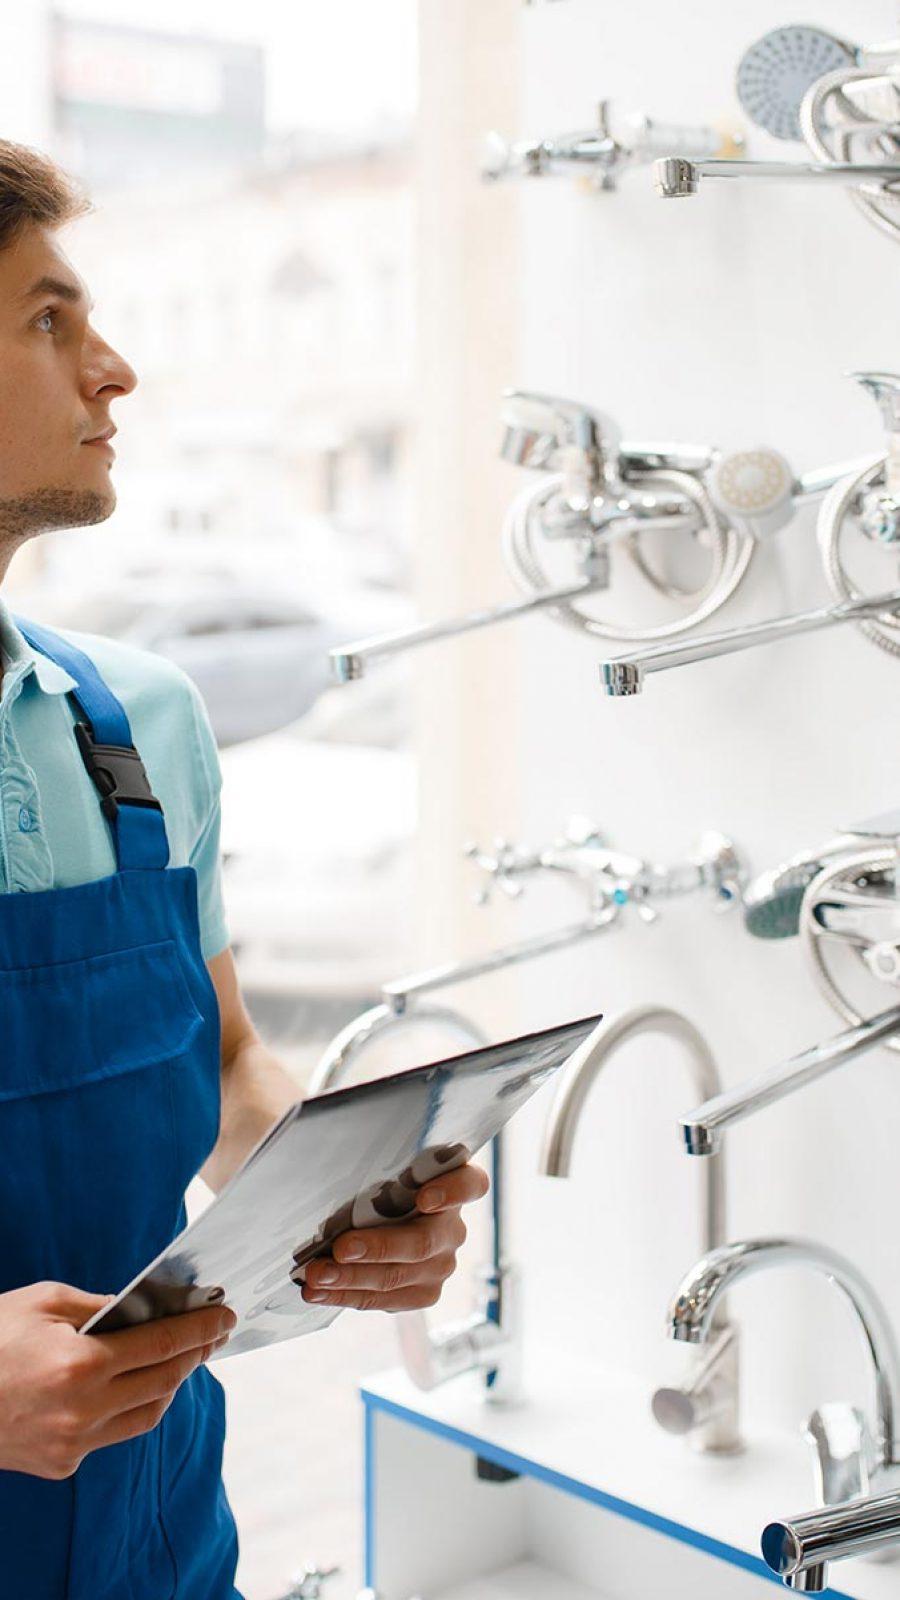 plumber-in-uniform-at-showcase-in-plumbering-store-PLGMWW8.jpg